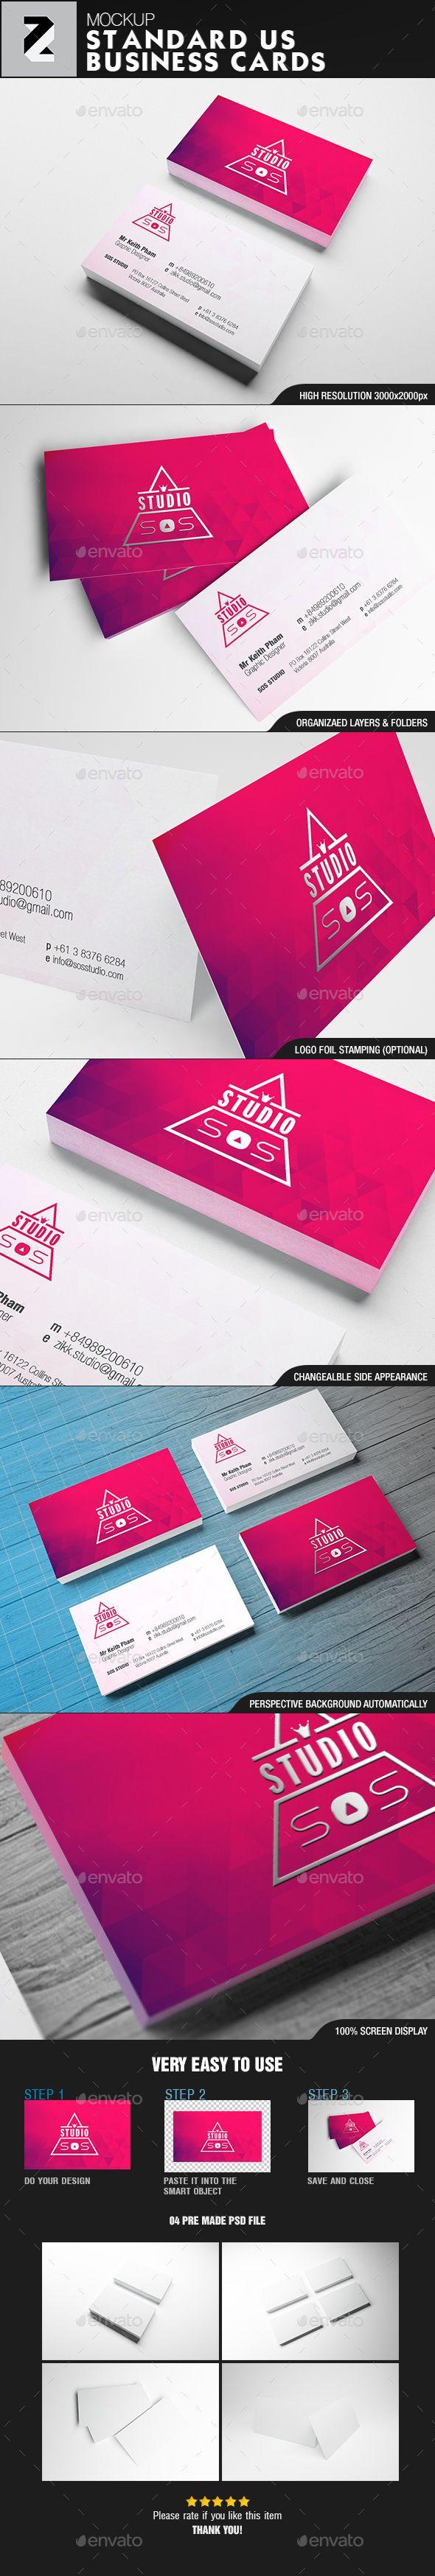 Standard us business card mockup mockup business cards and font logo standard us business card mockup reheart Choice Image